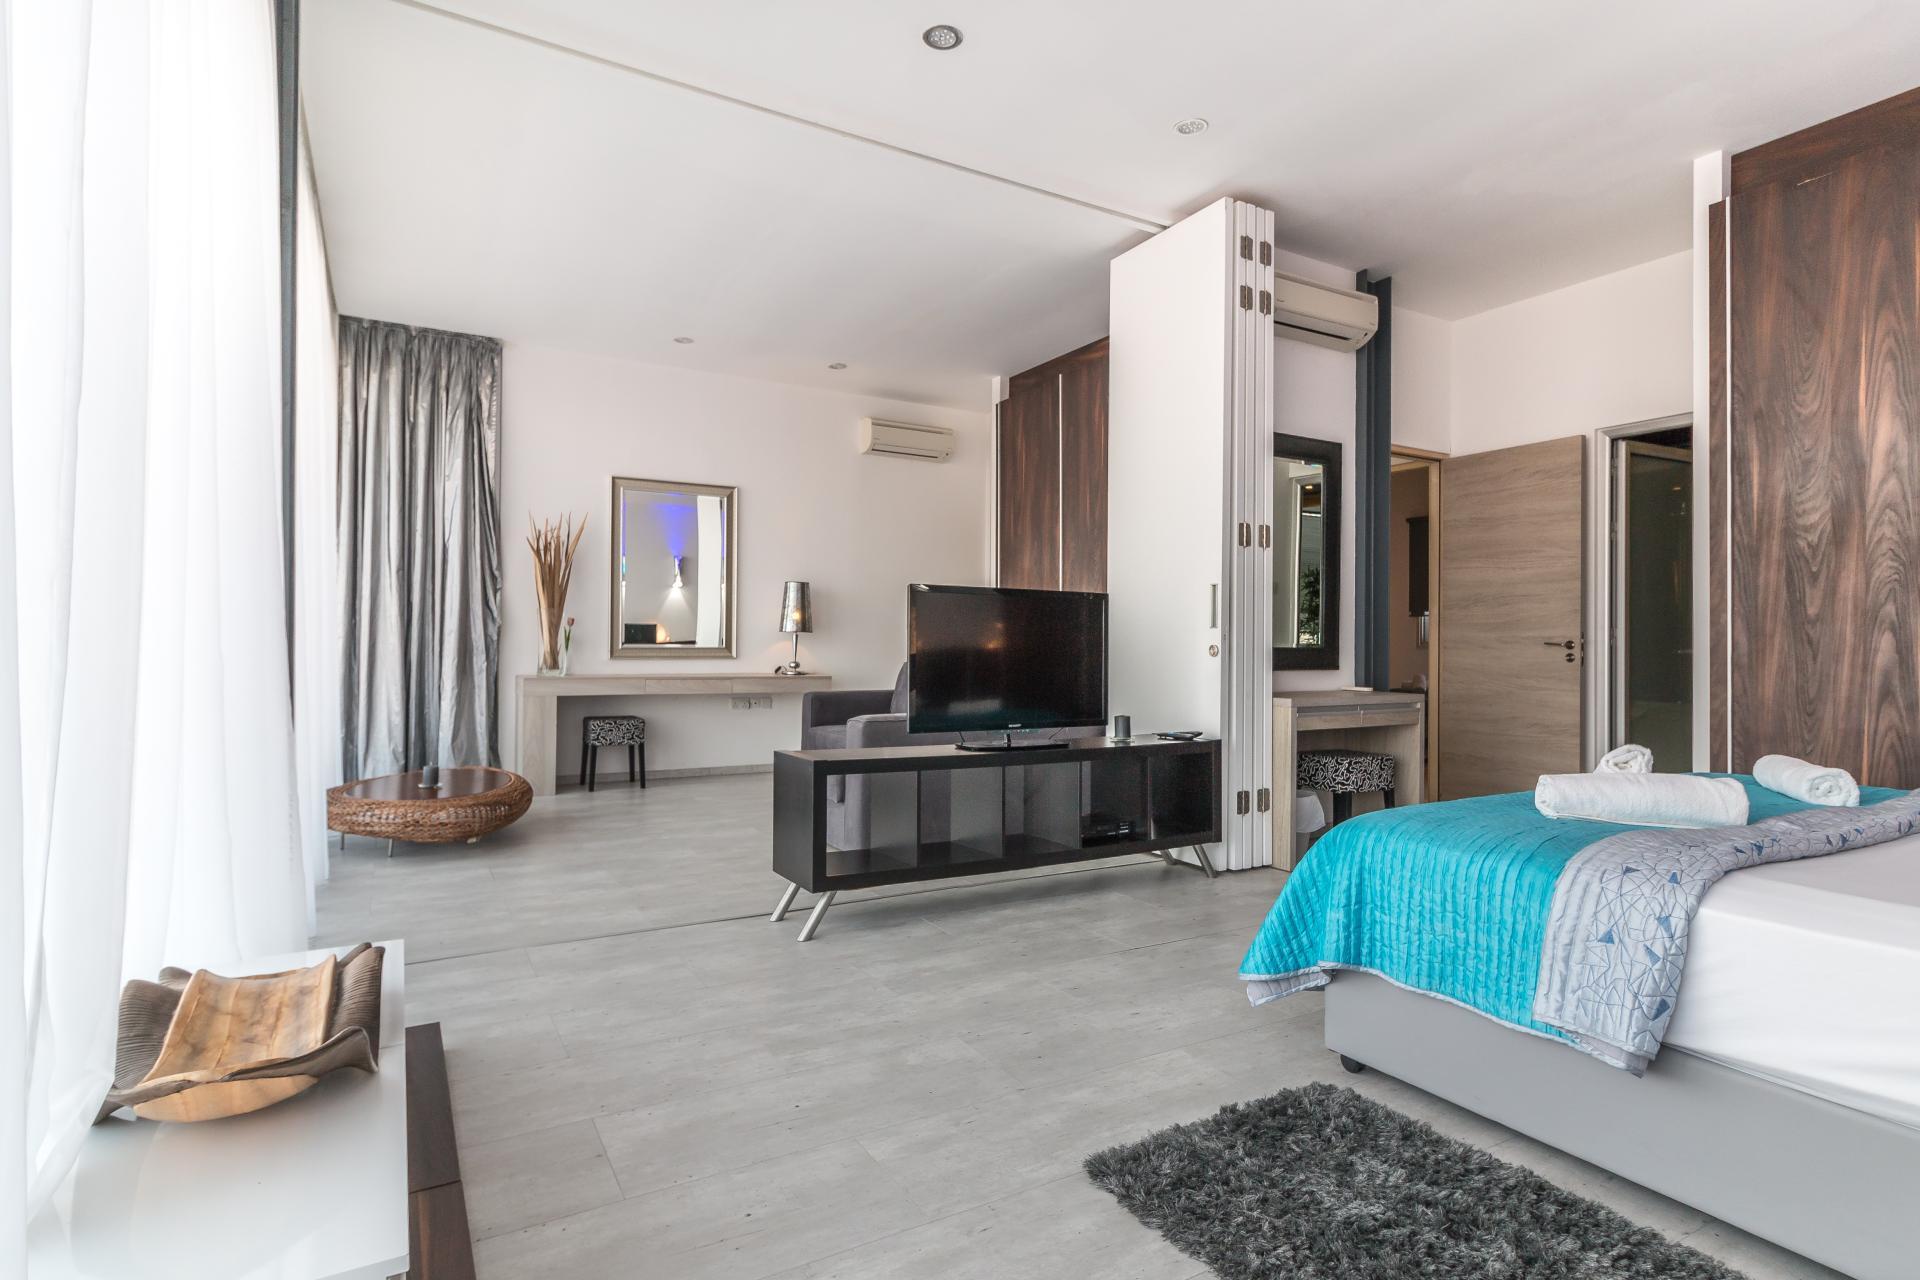 Meubles Salle De Bain ~ cozy apartament habiter biz